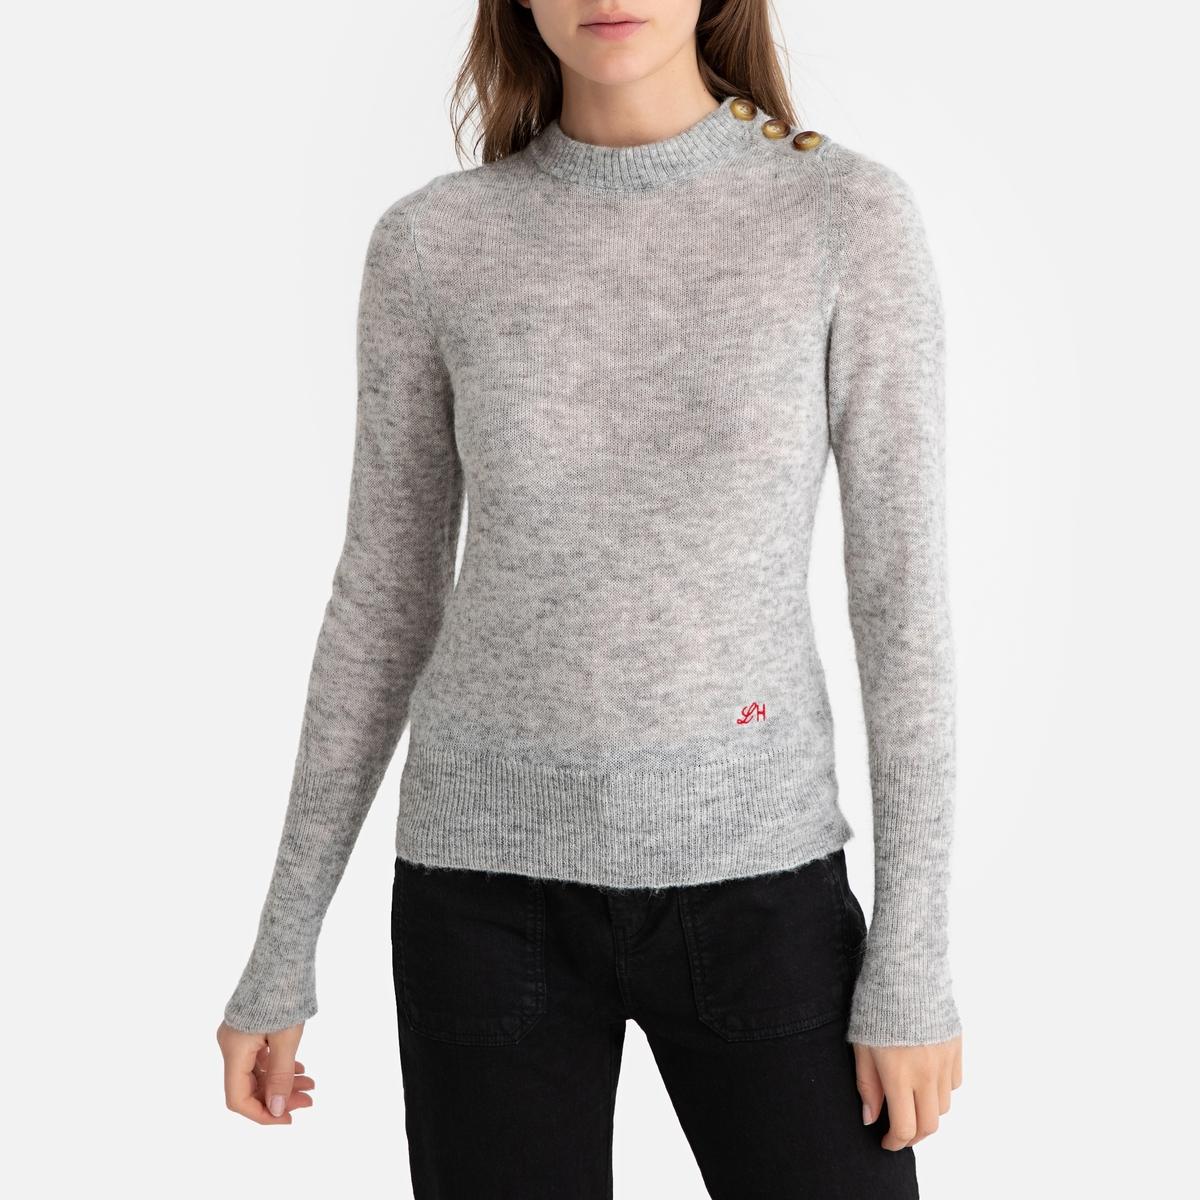 Пуловер La Redoute Из тонкого трикотажа с пуговицами на плече MANTECA M серый цена в Москве и Питере